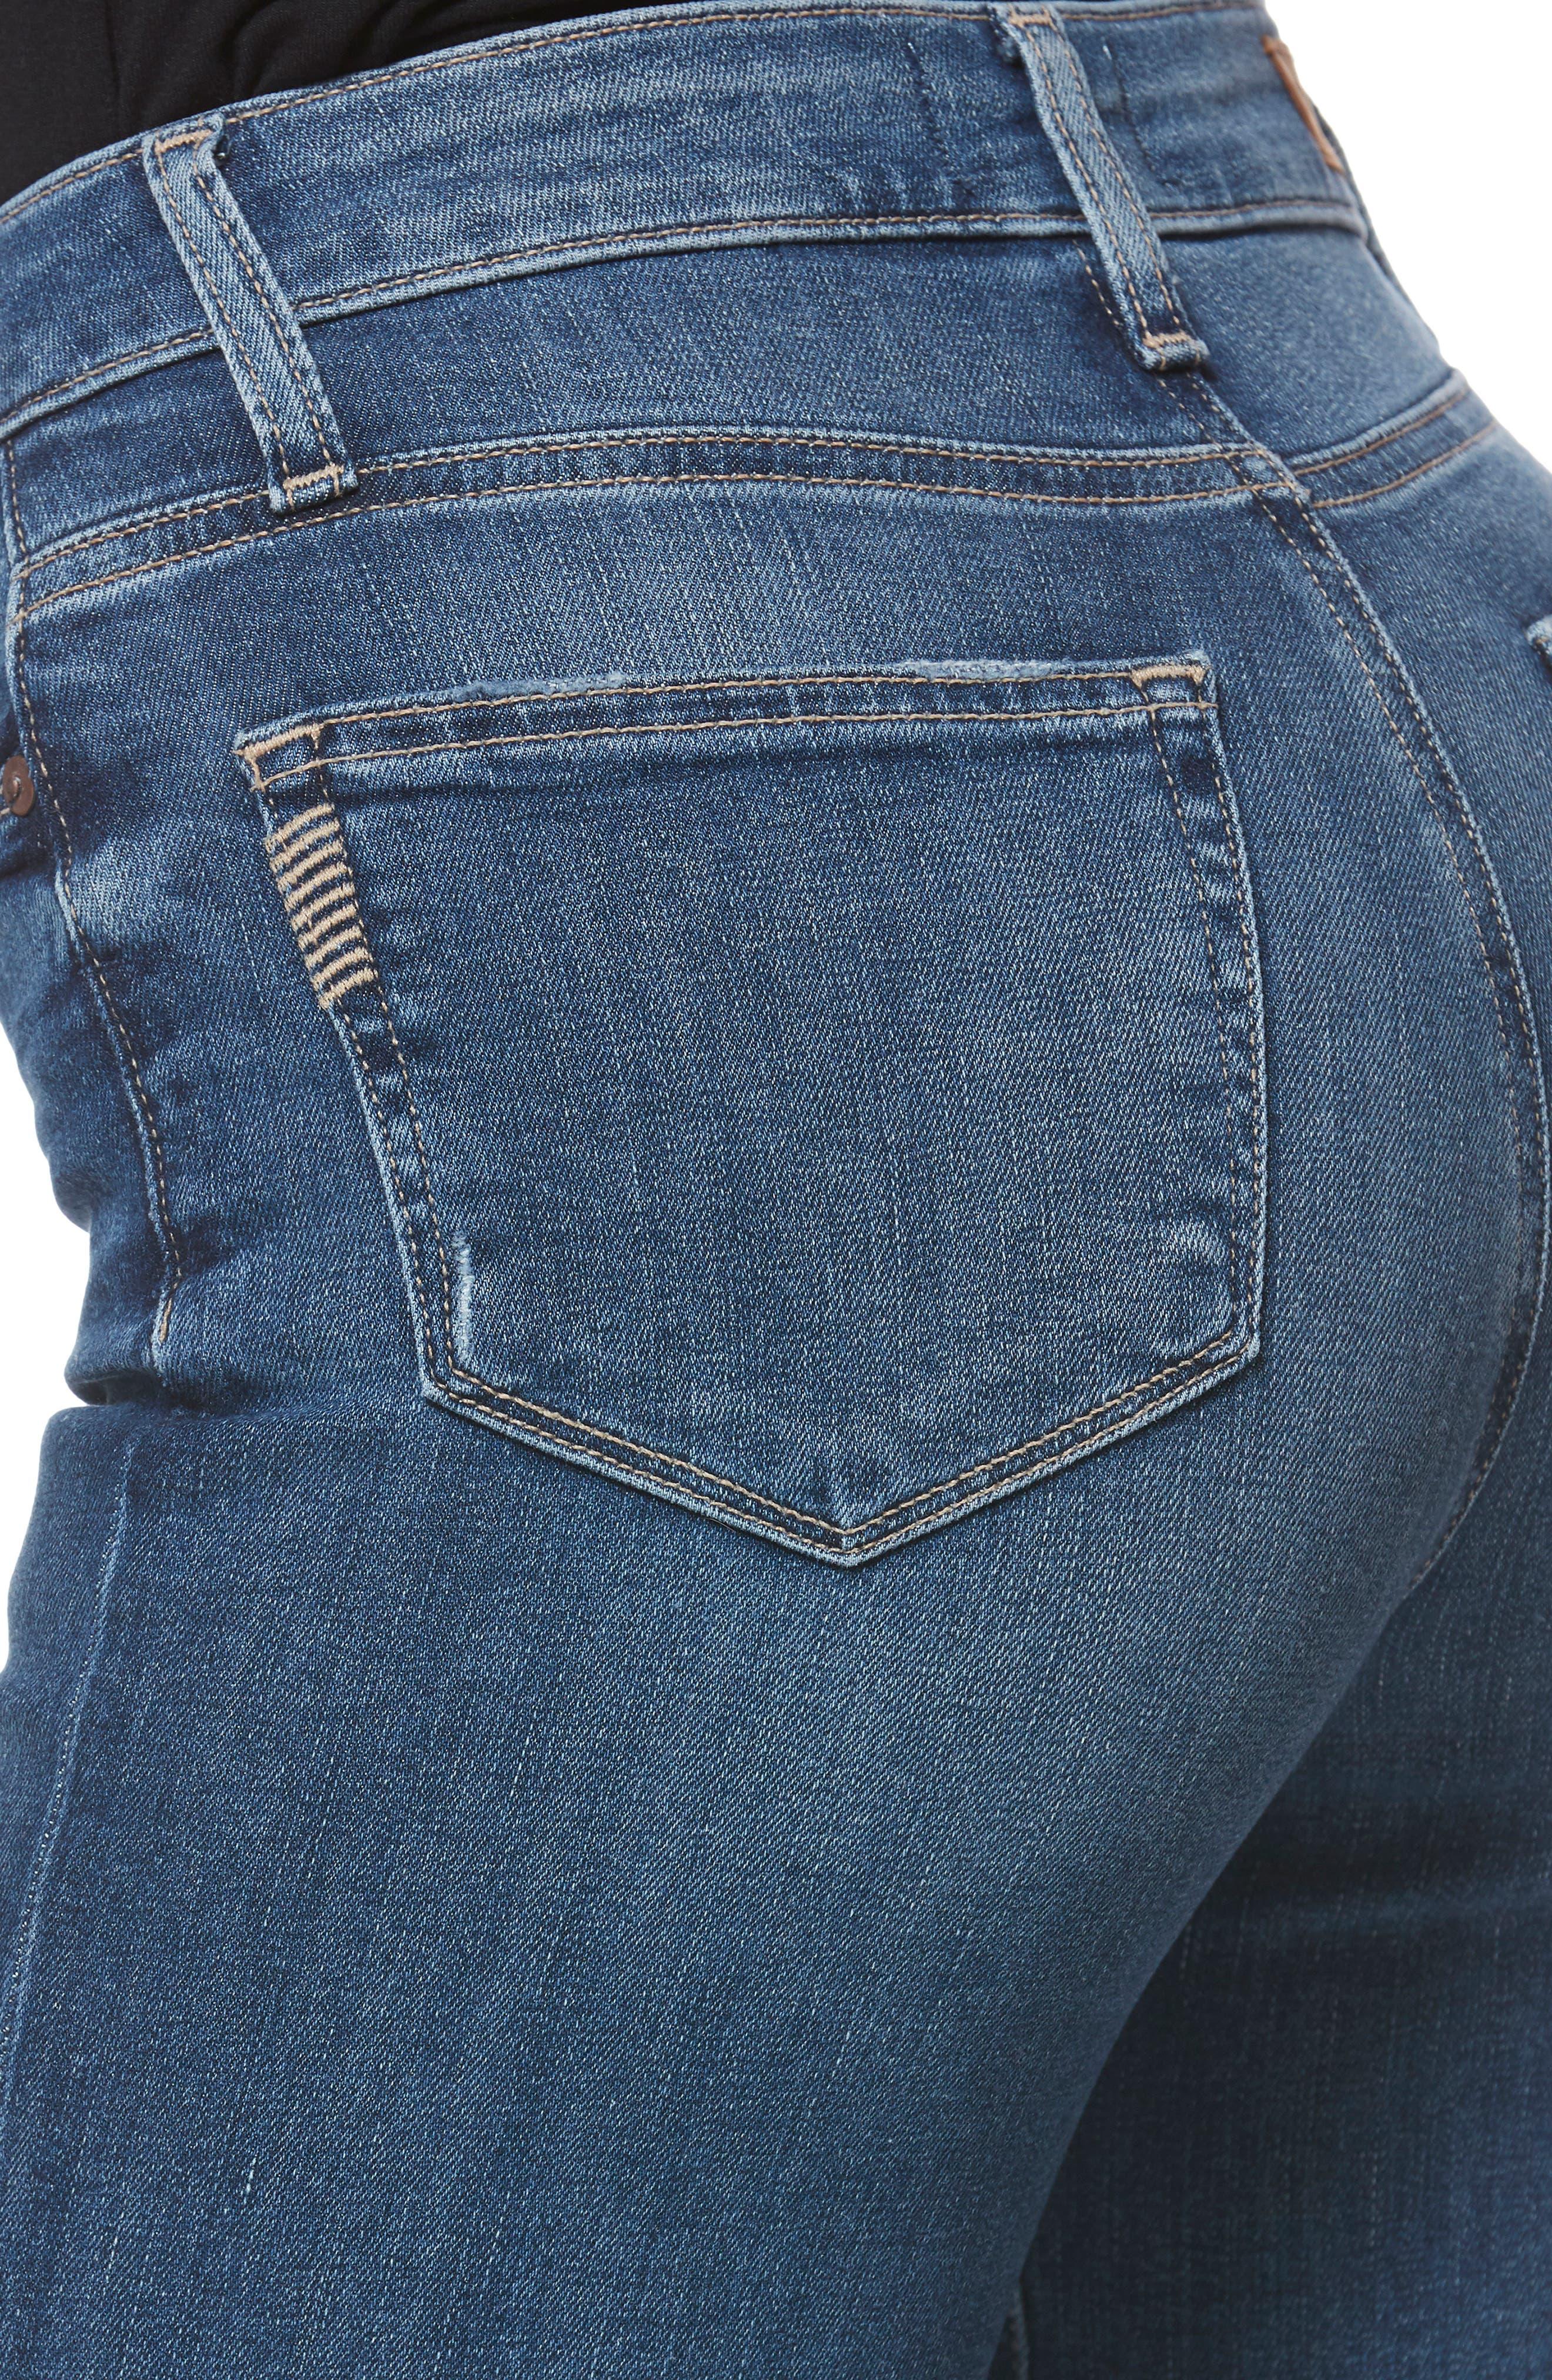 Transcend Vintage - Margot High Waist Ankle Straight Leg Jeans,                             Alternate thumbnail 4, color,                             HANNIE